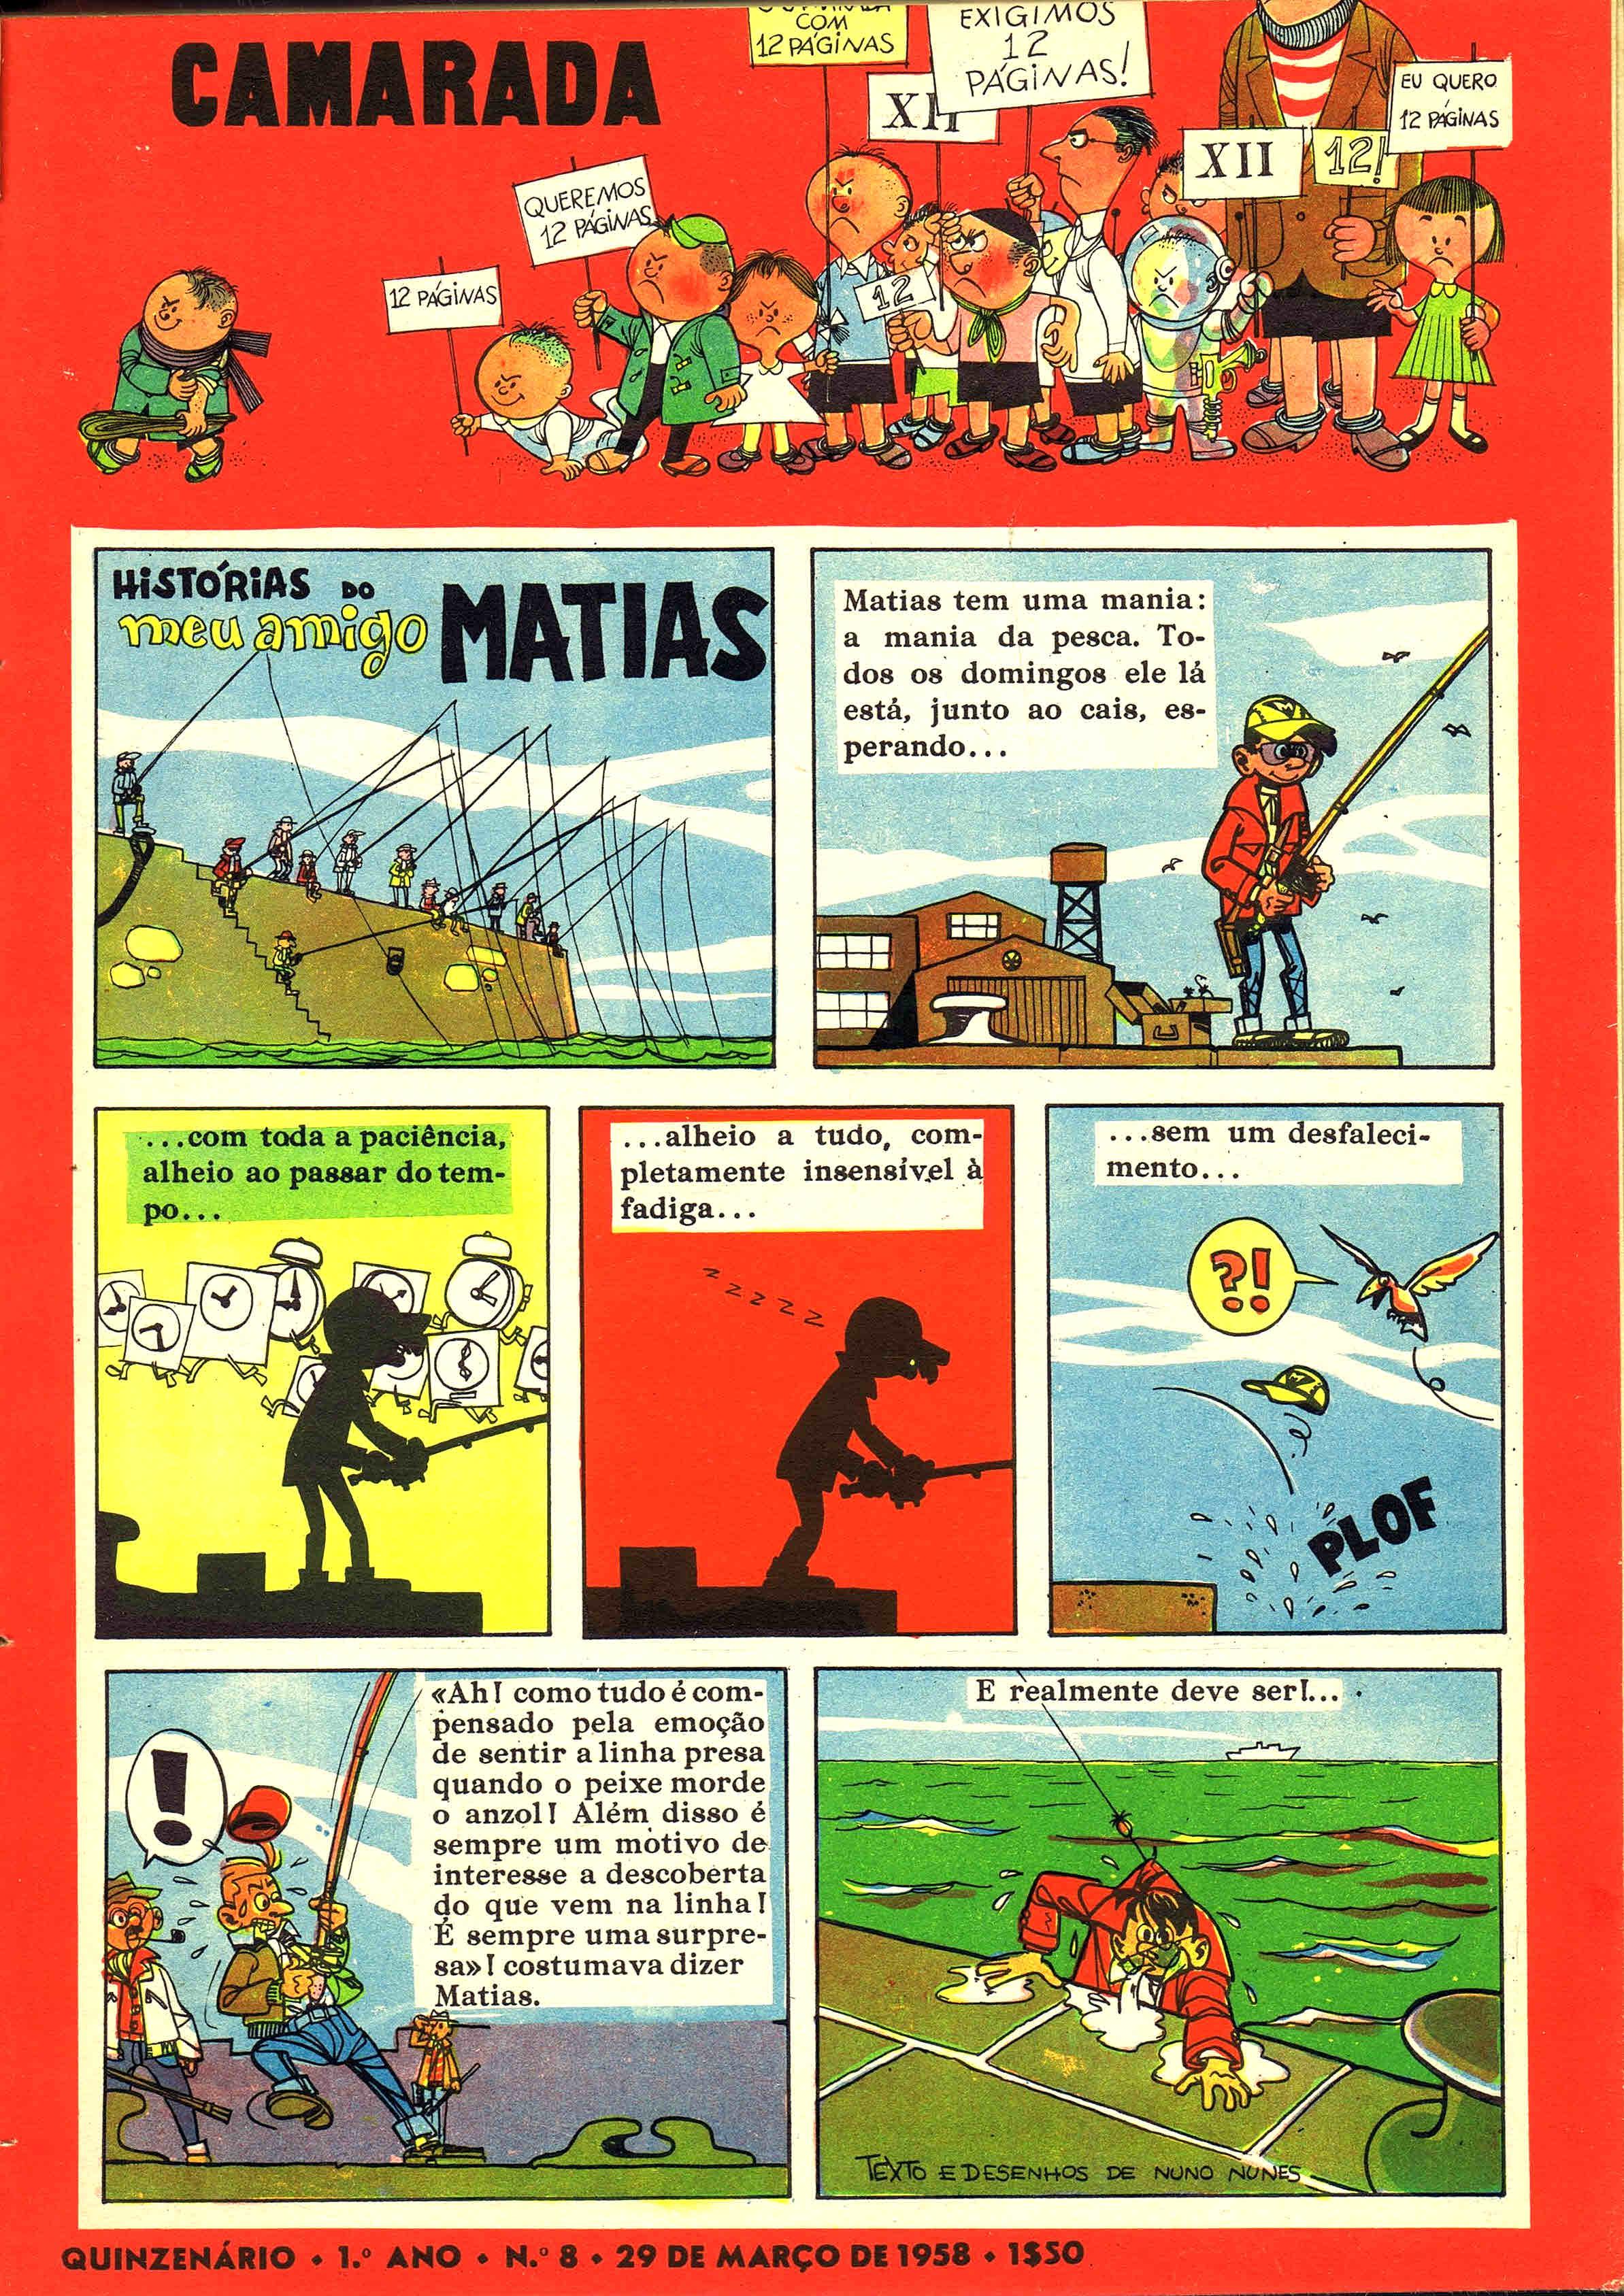 camarada mocidade portuguesa nº 8 1958